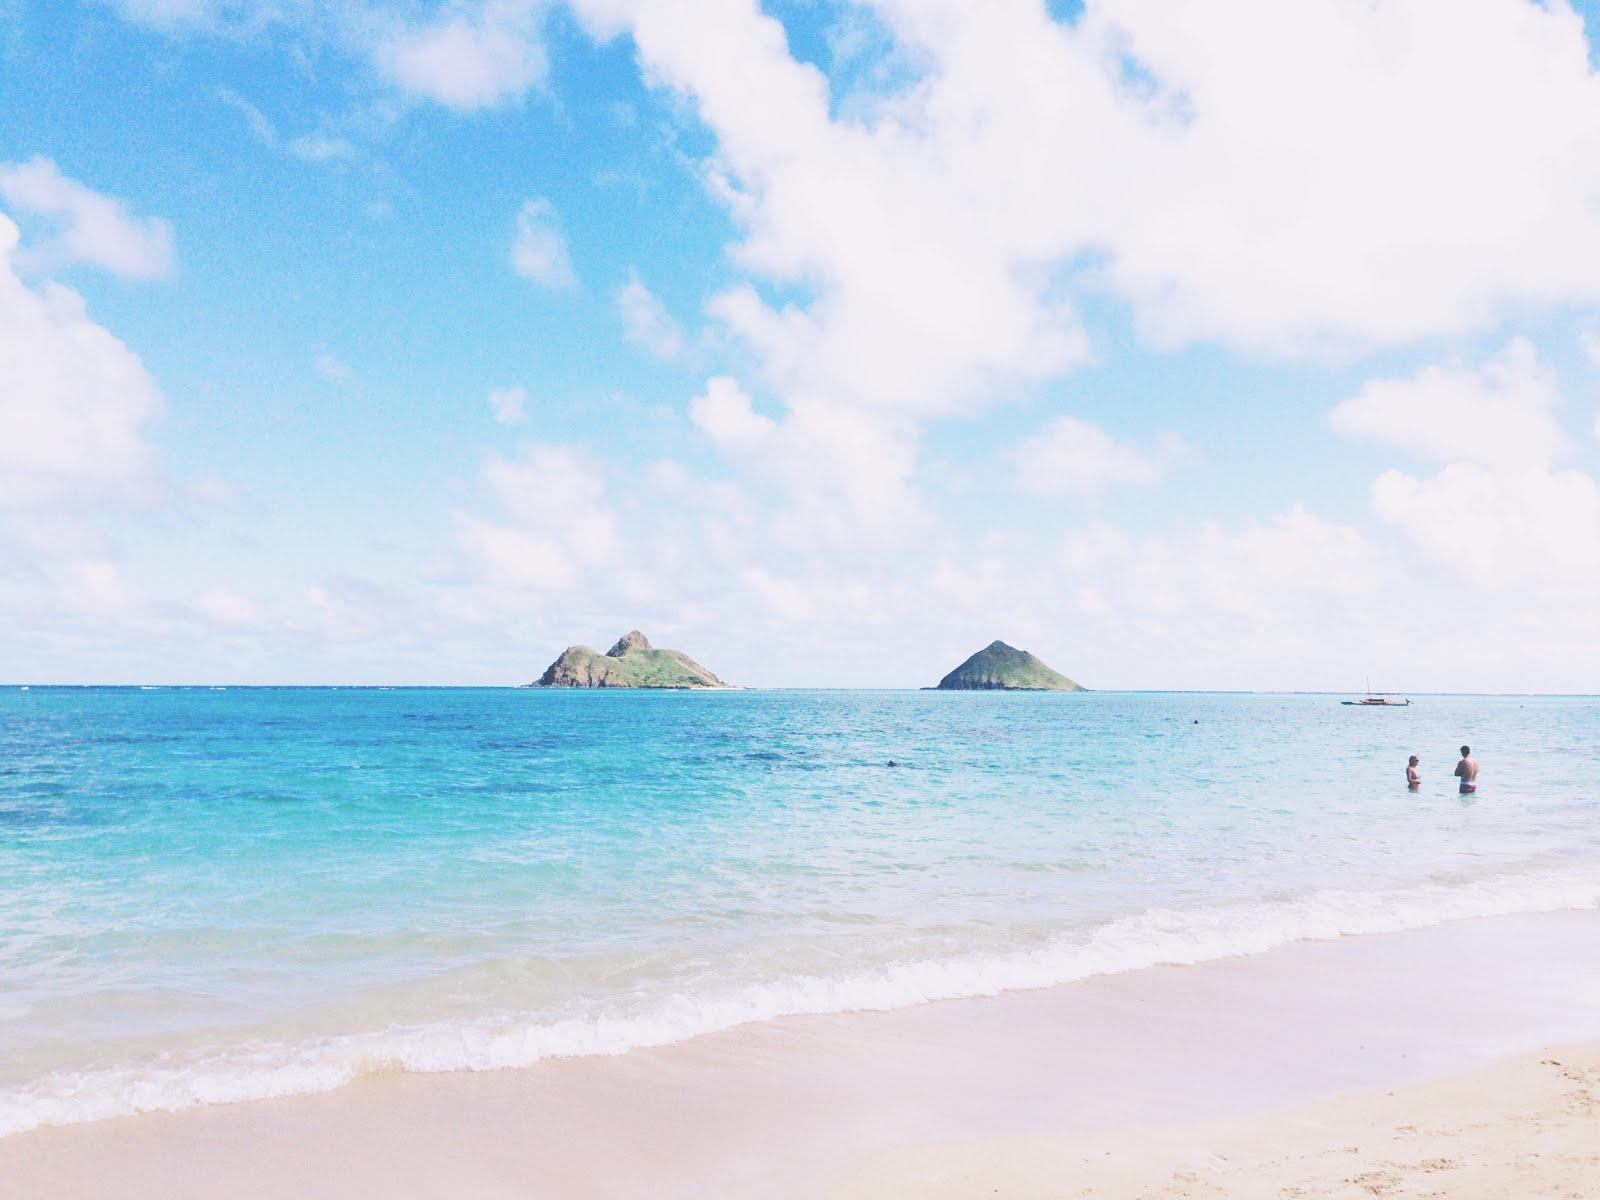 Lanikai Beach, Oahu (Hawaii)